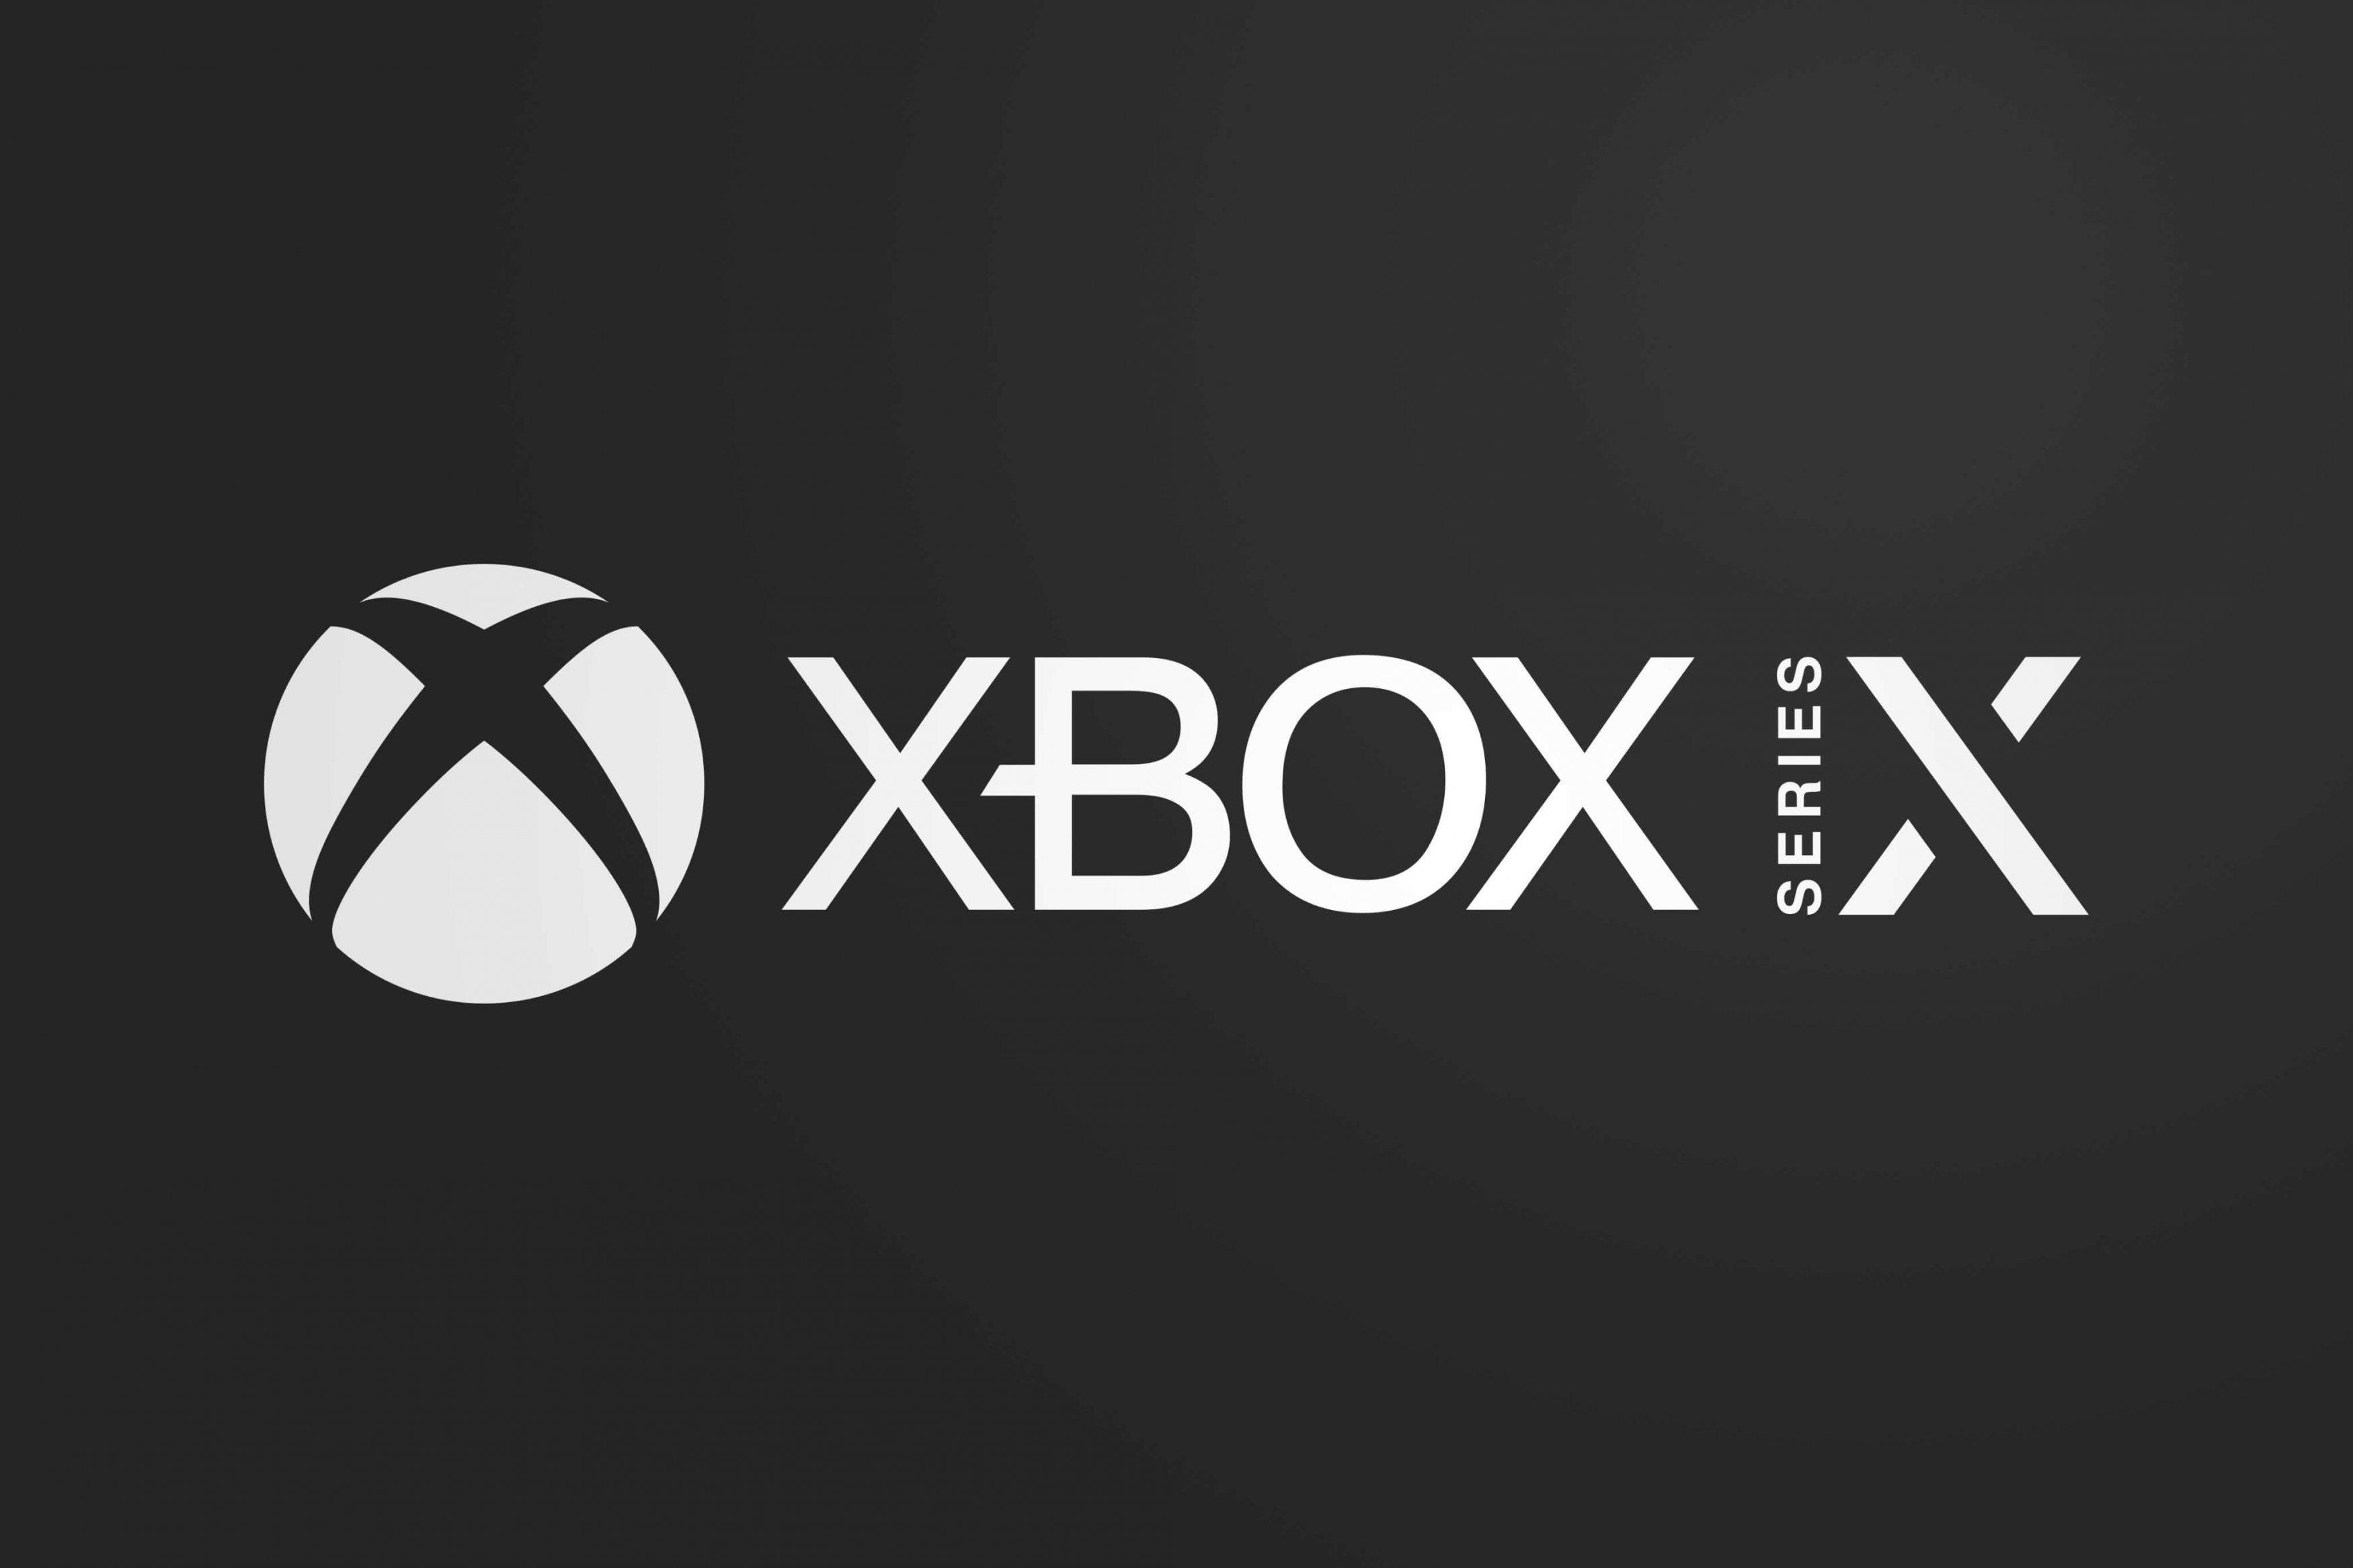 xboxsx.jpg